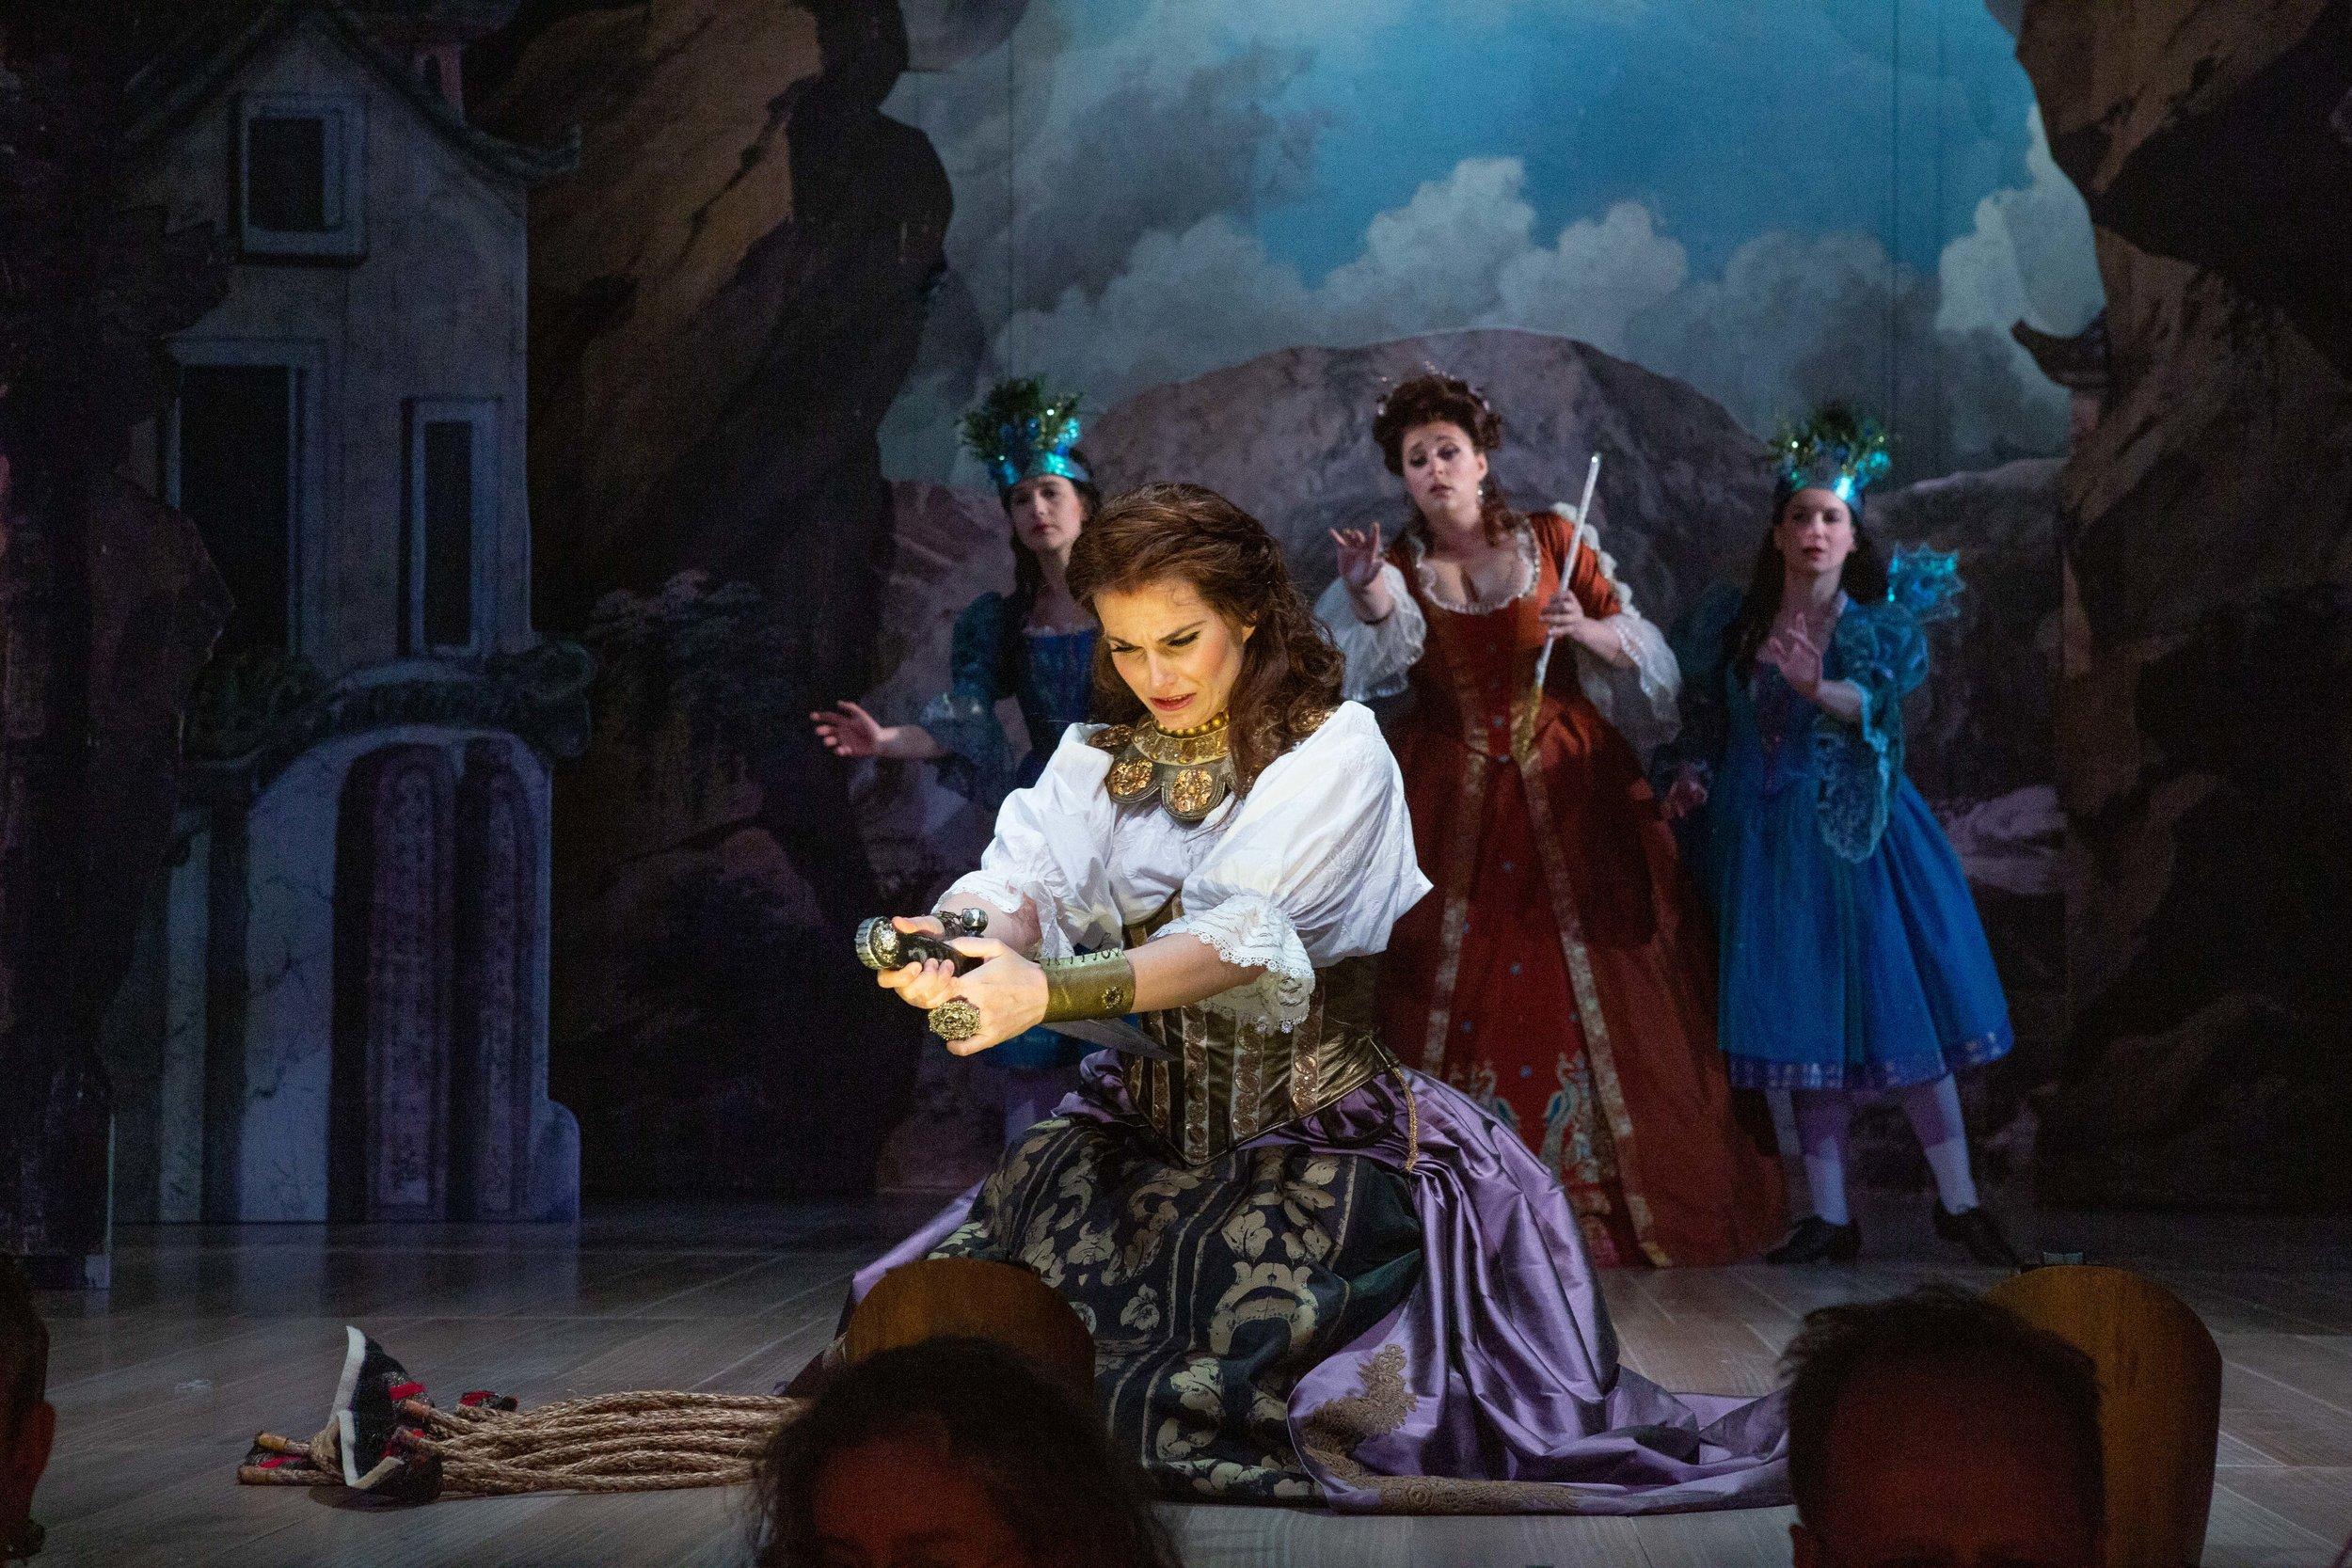 Soprano Emöke Baráth (as Bradamante) prepares to undo herself for love, in Steffani's Orlando generoso. Kathy Wittman photograph